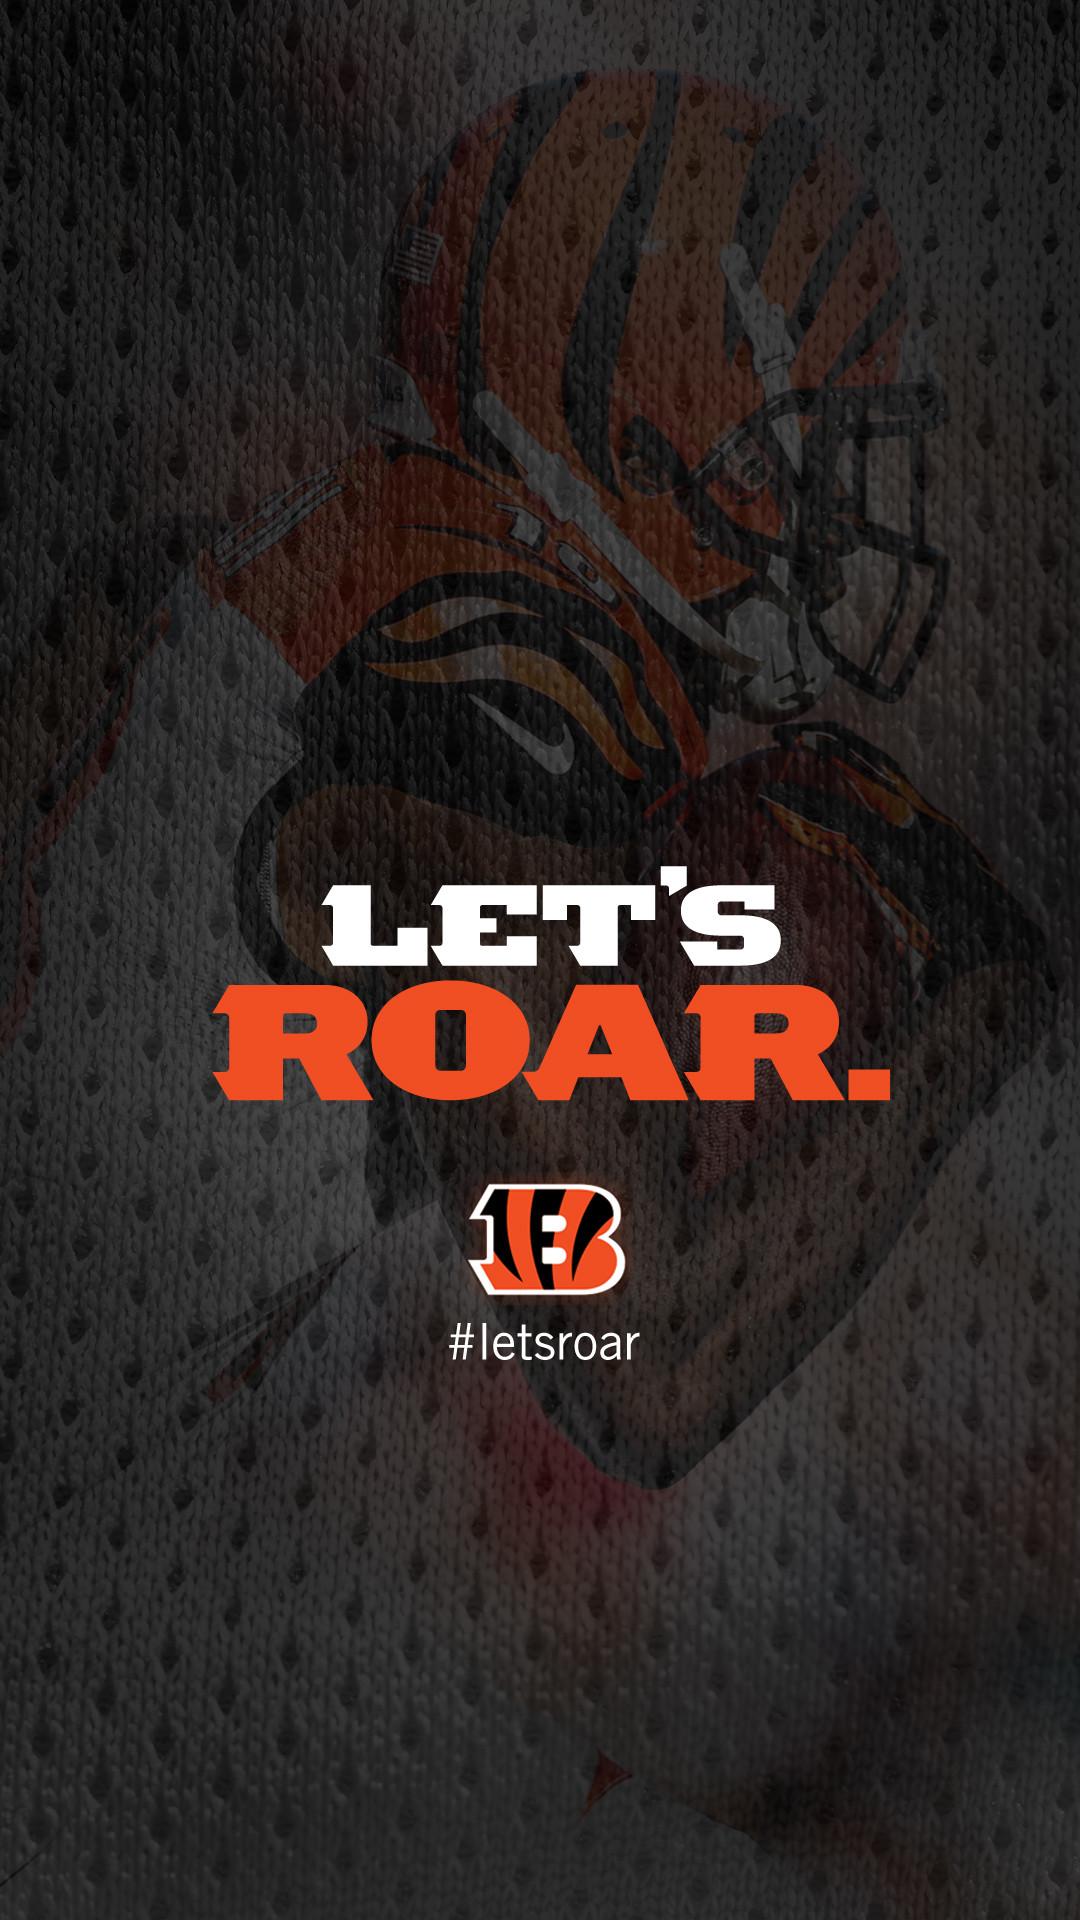 NFL Cincinnati Bengals meme The Bengals Pinterest Videos   HD Wallpapers    Pinterest   Wallpaper